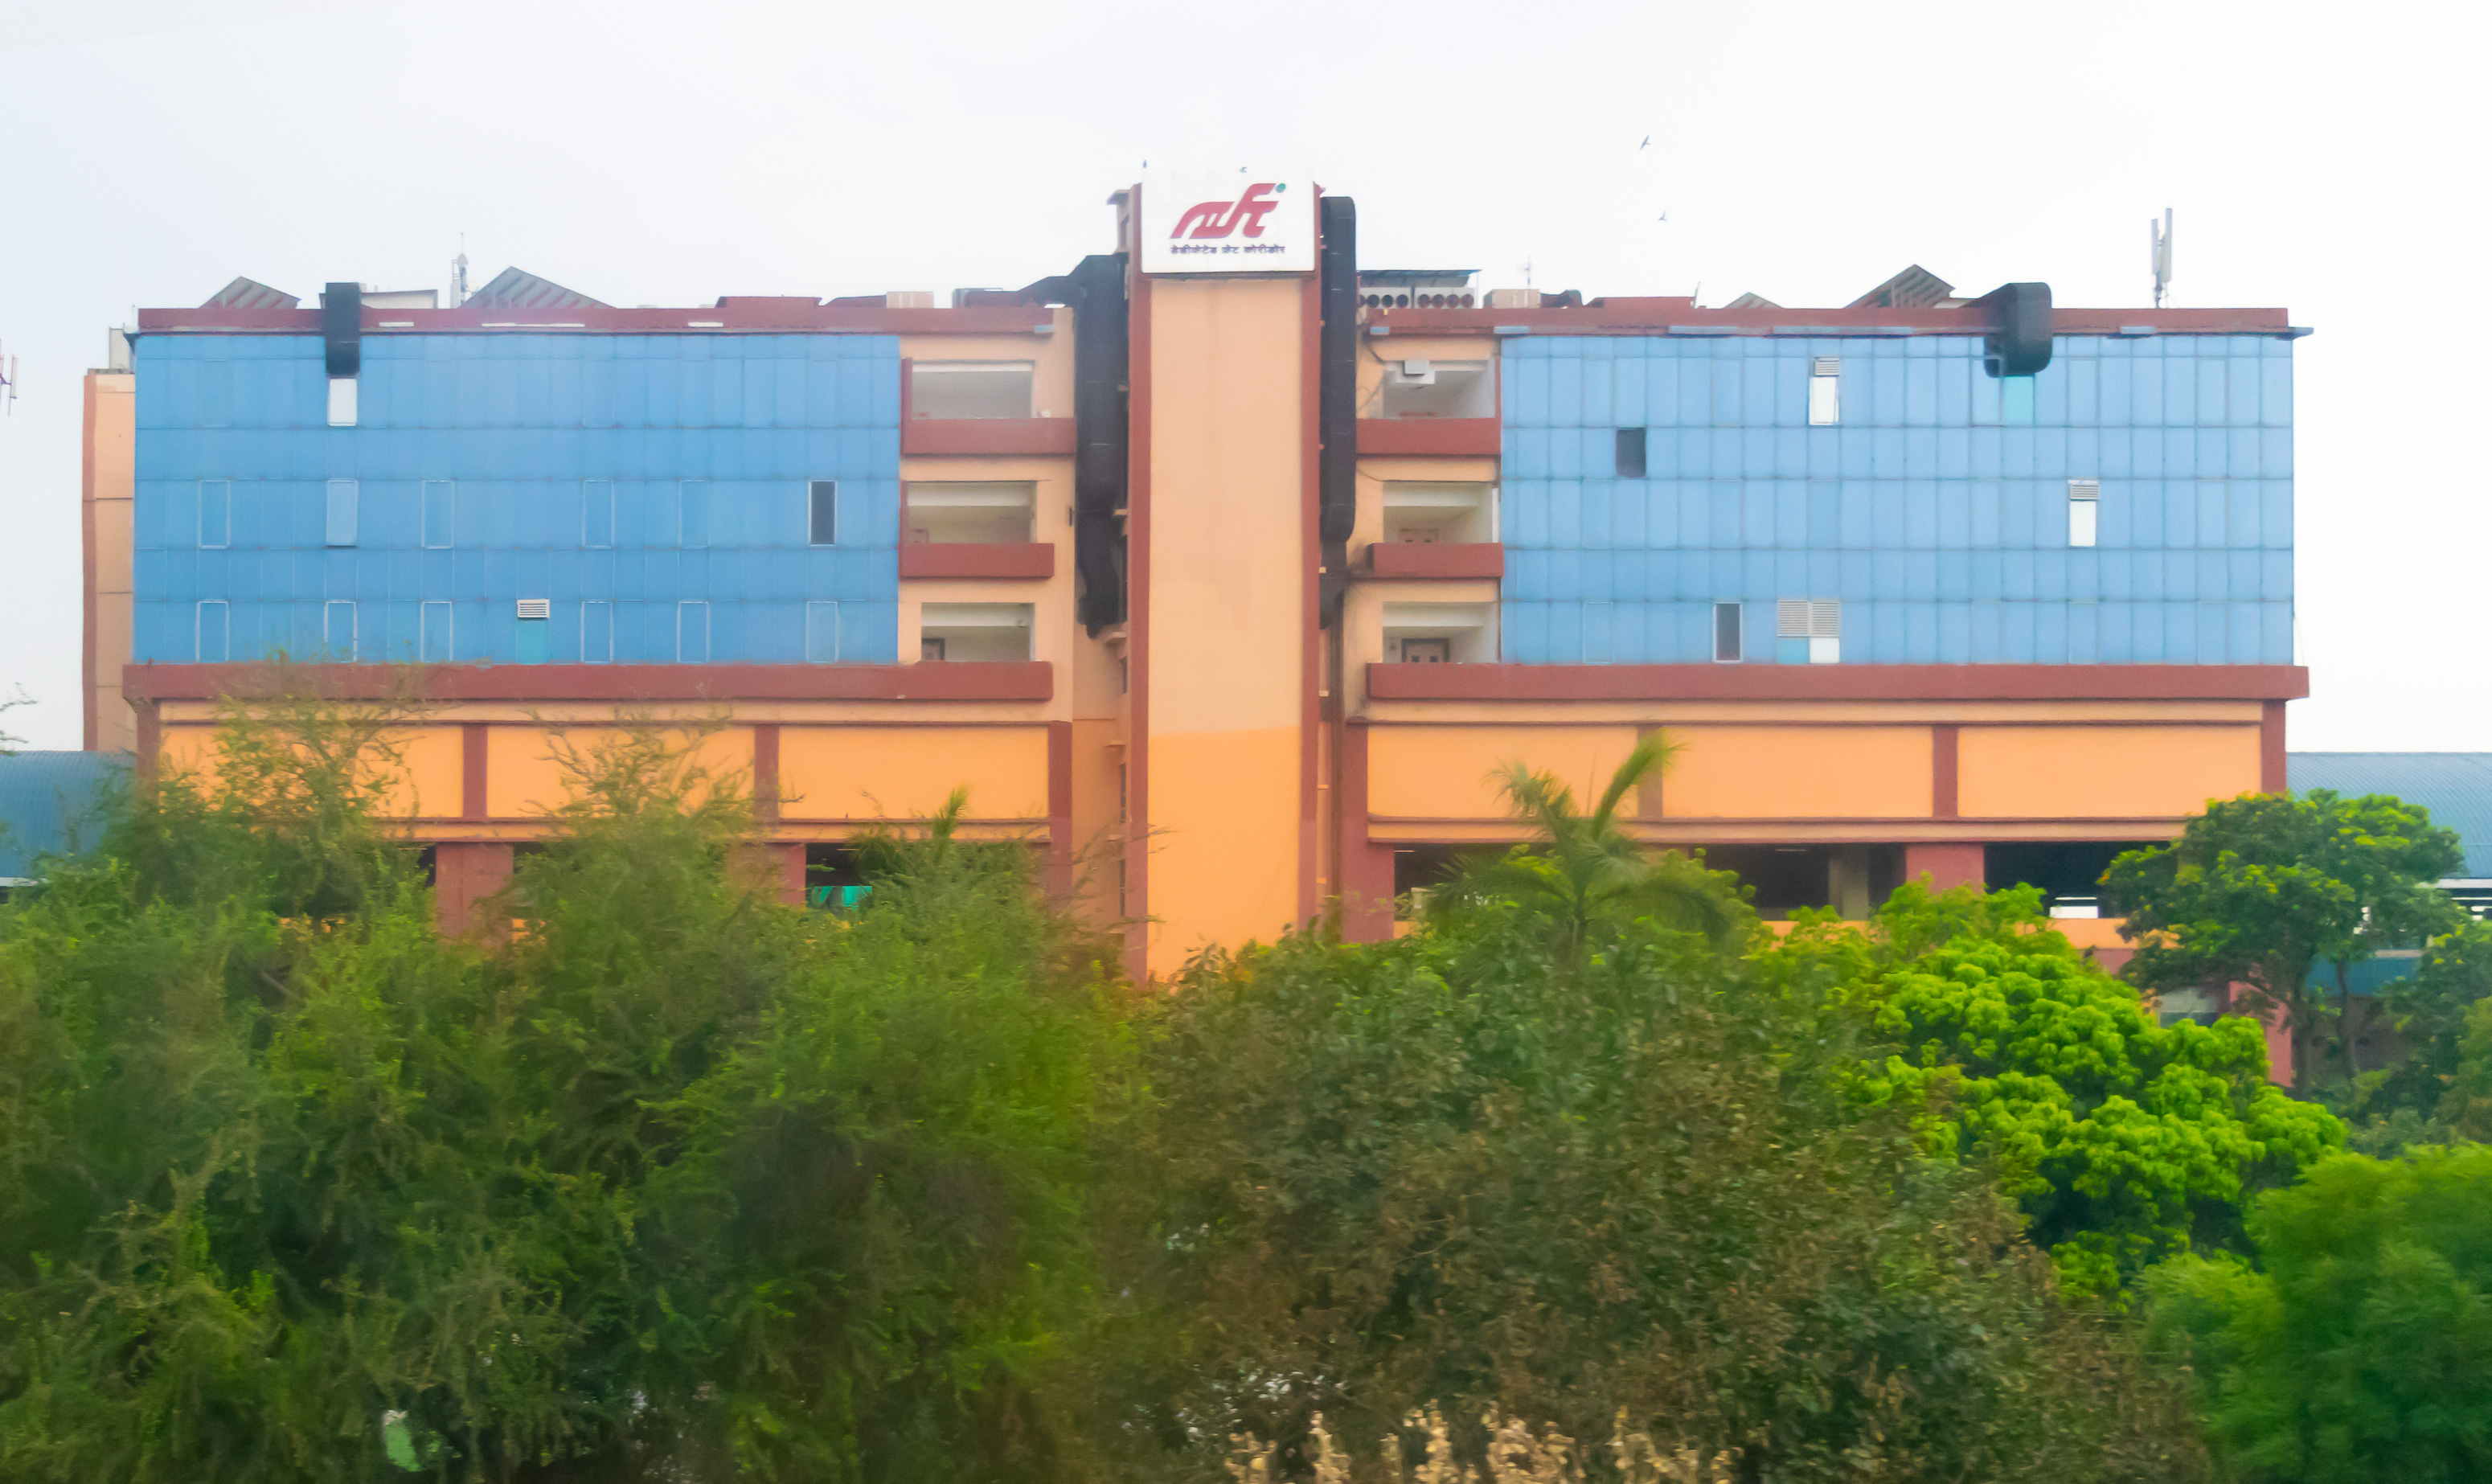 Dedicated Freight Corridor Corporation of India - Wikipedia